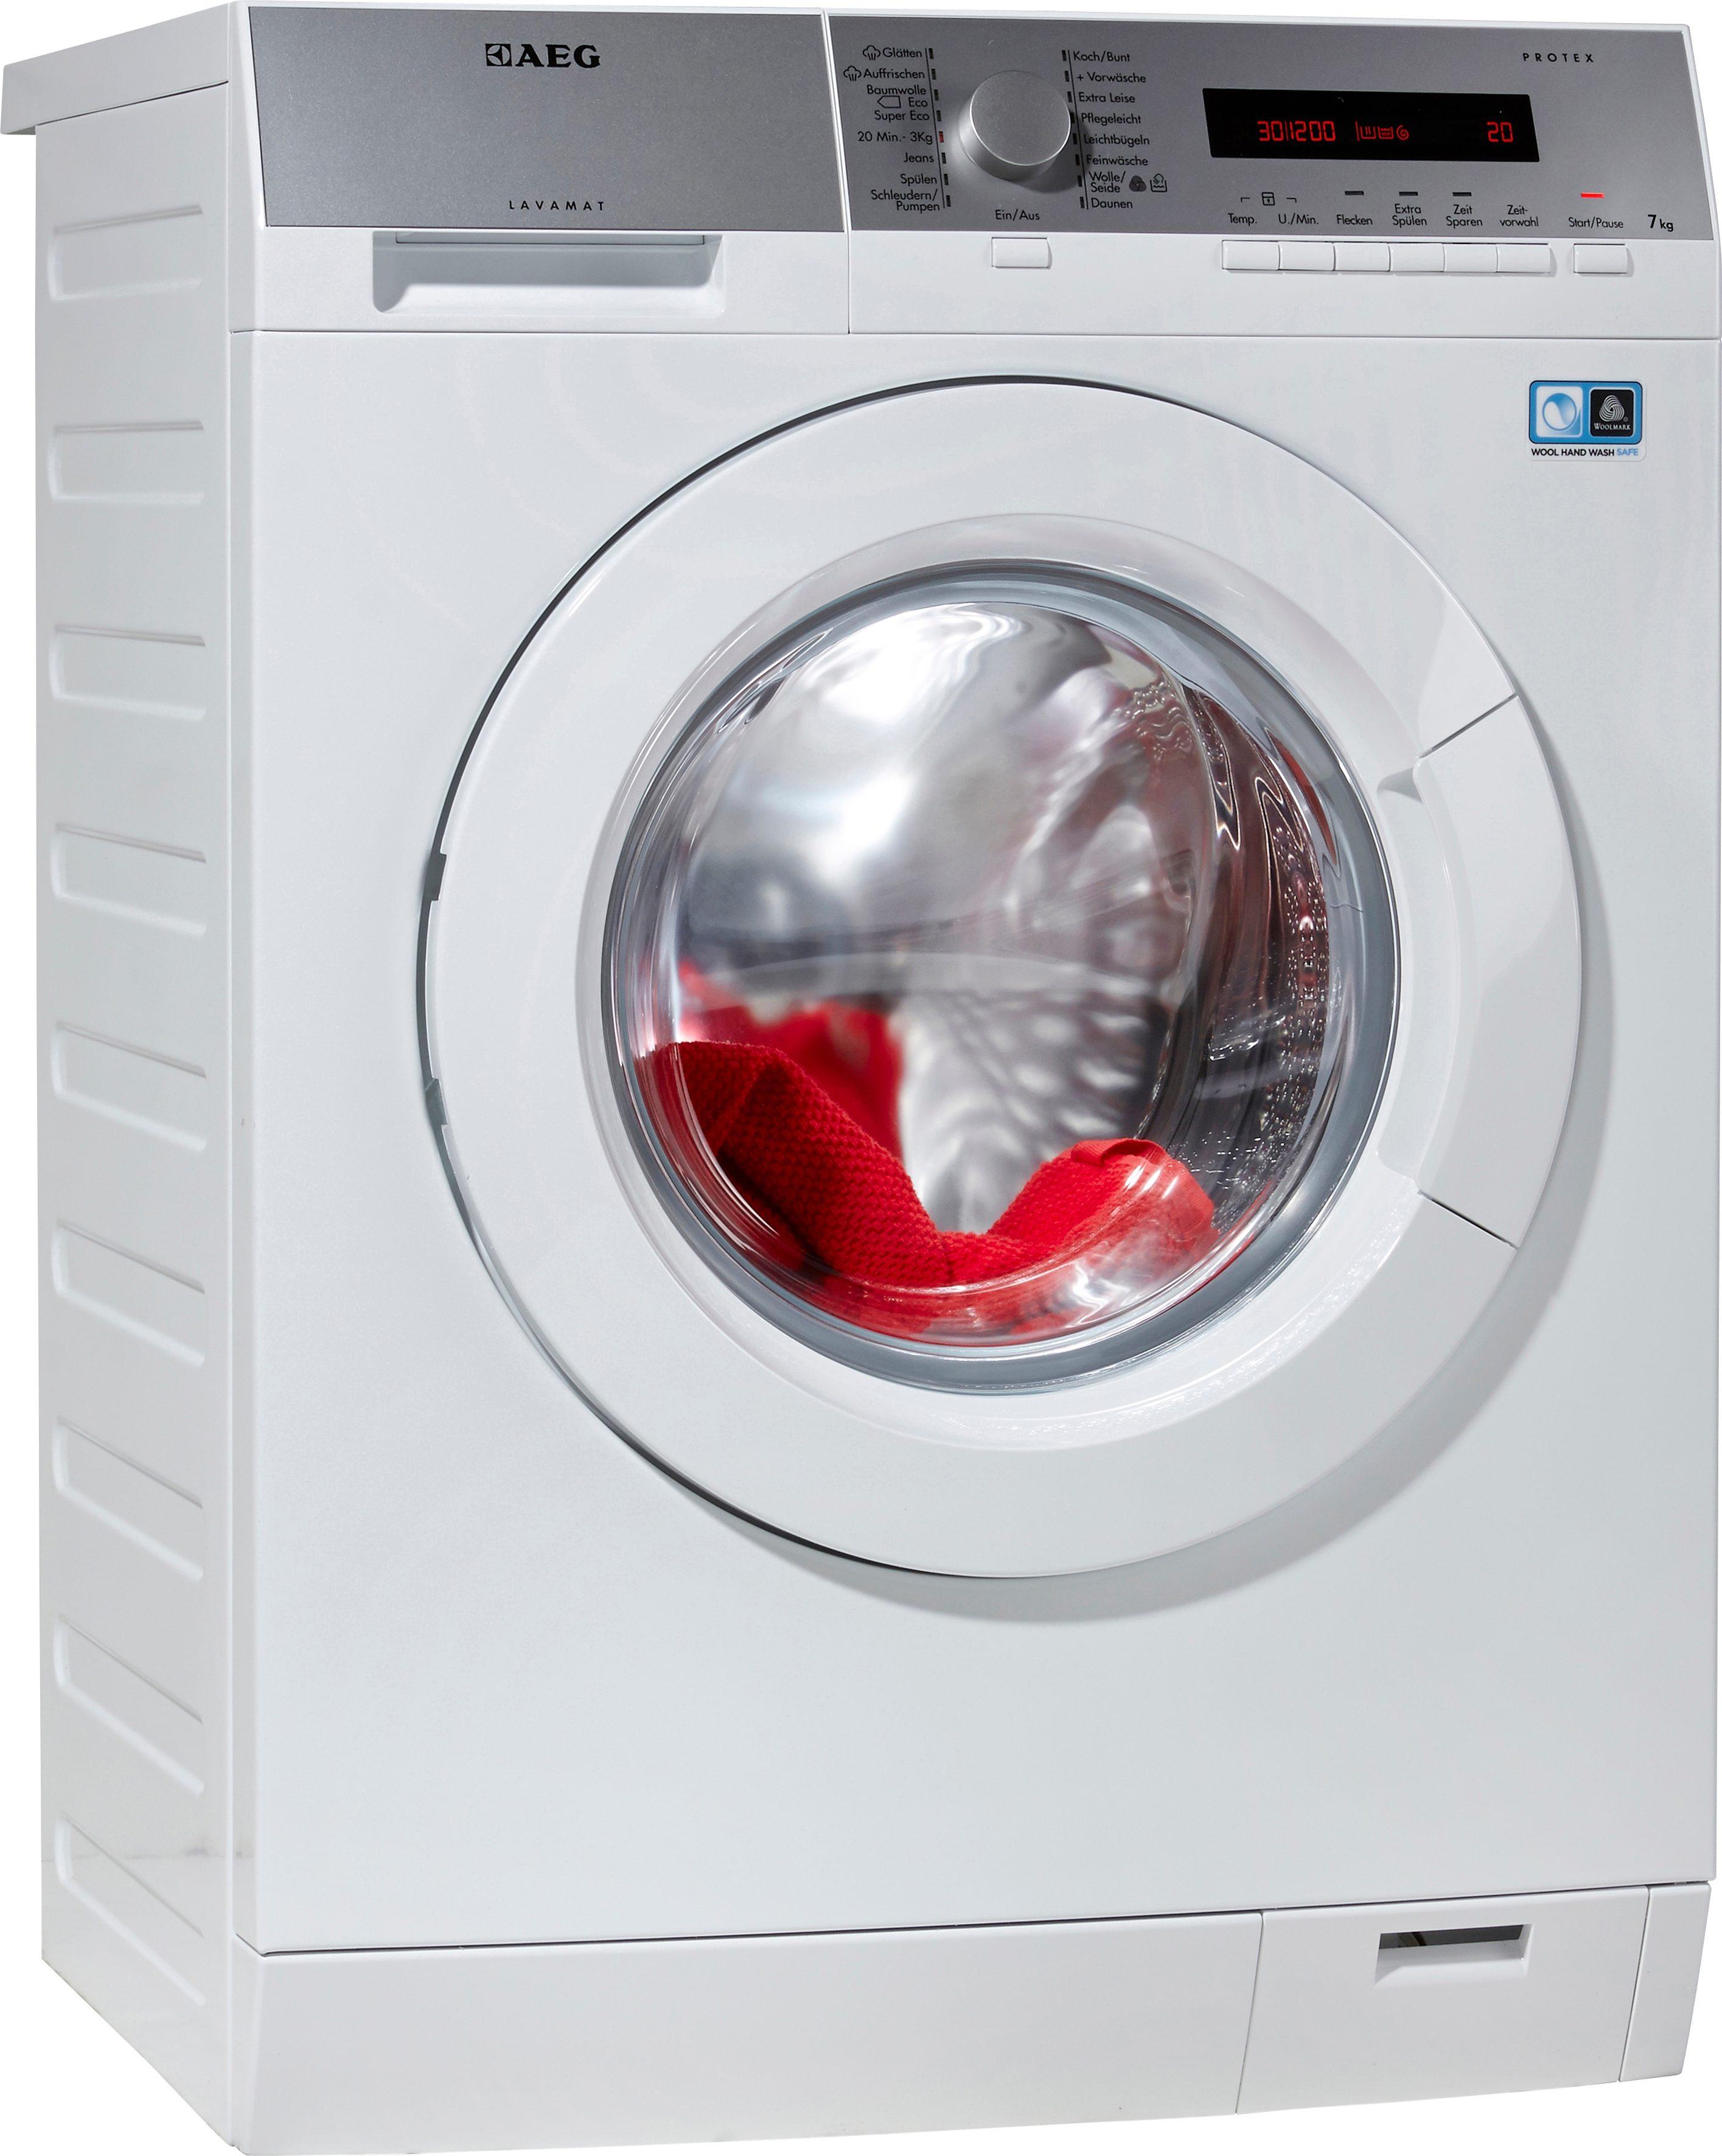 AEG Waschmaschine Lavamat L7.20FL, A+++, 7 kg, 1400 U/Min